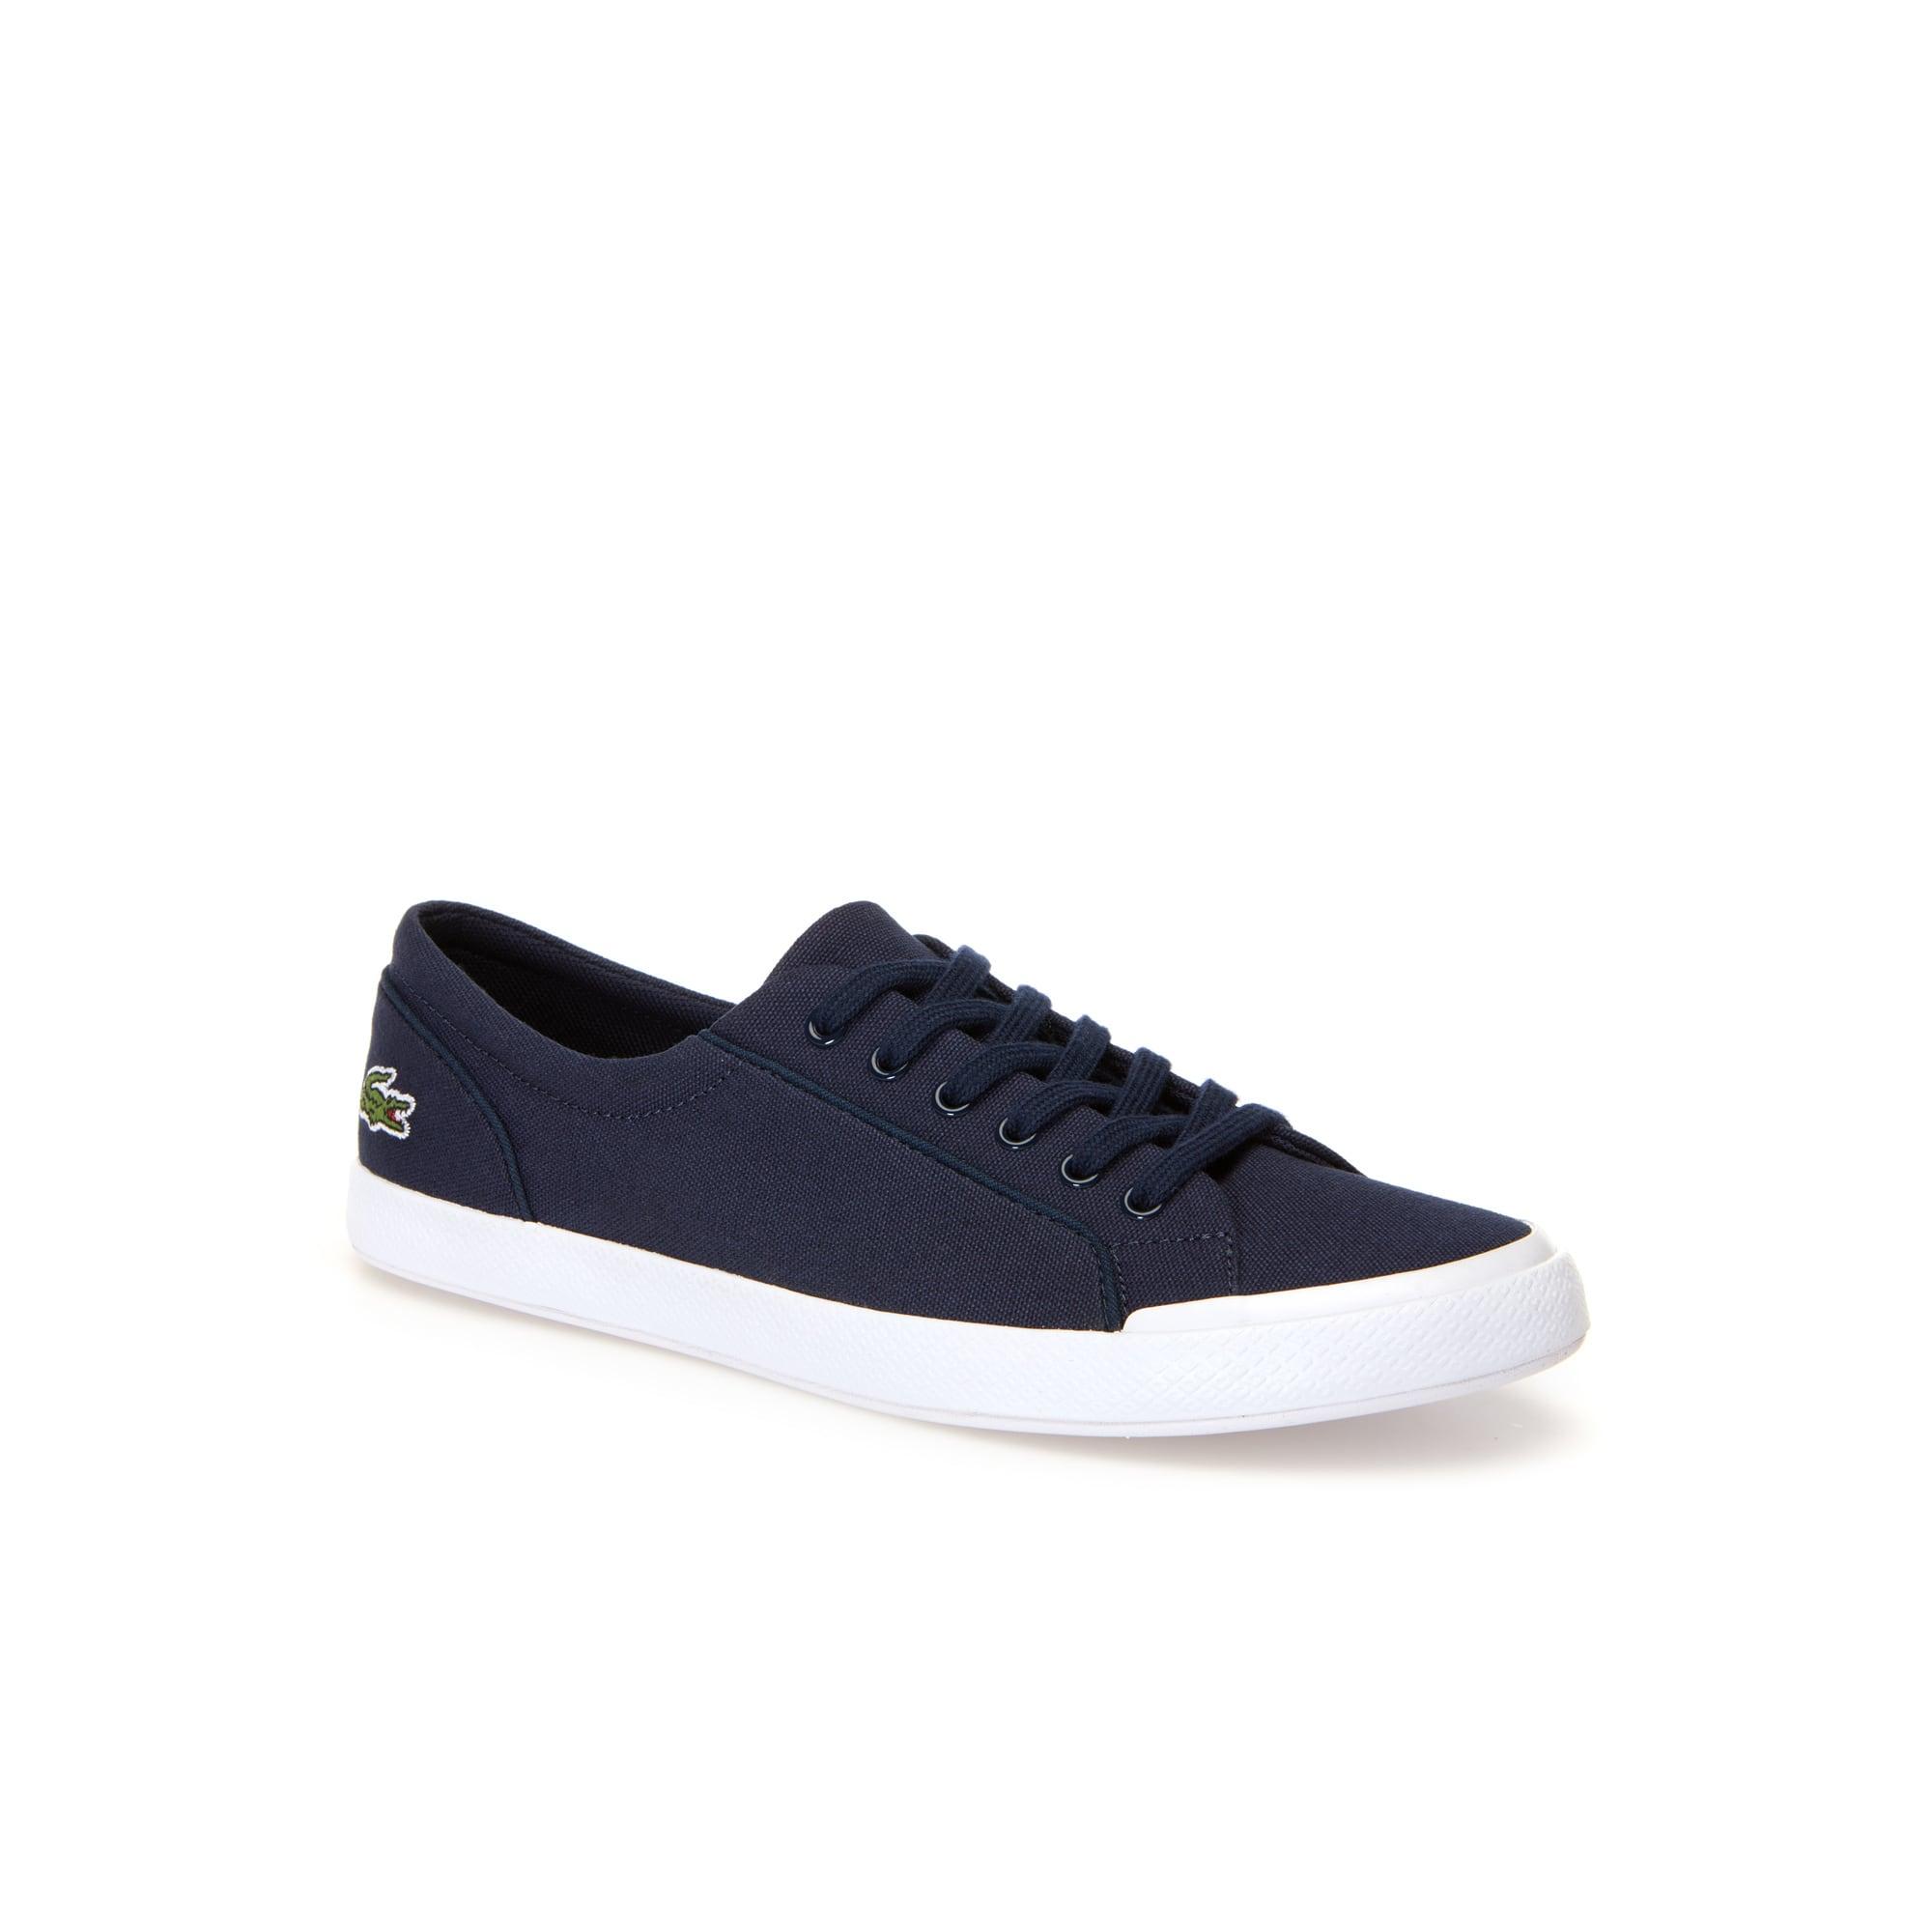 c2c7c79ab8422 Zapatos para mujer